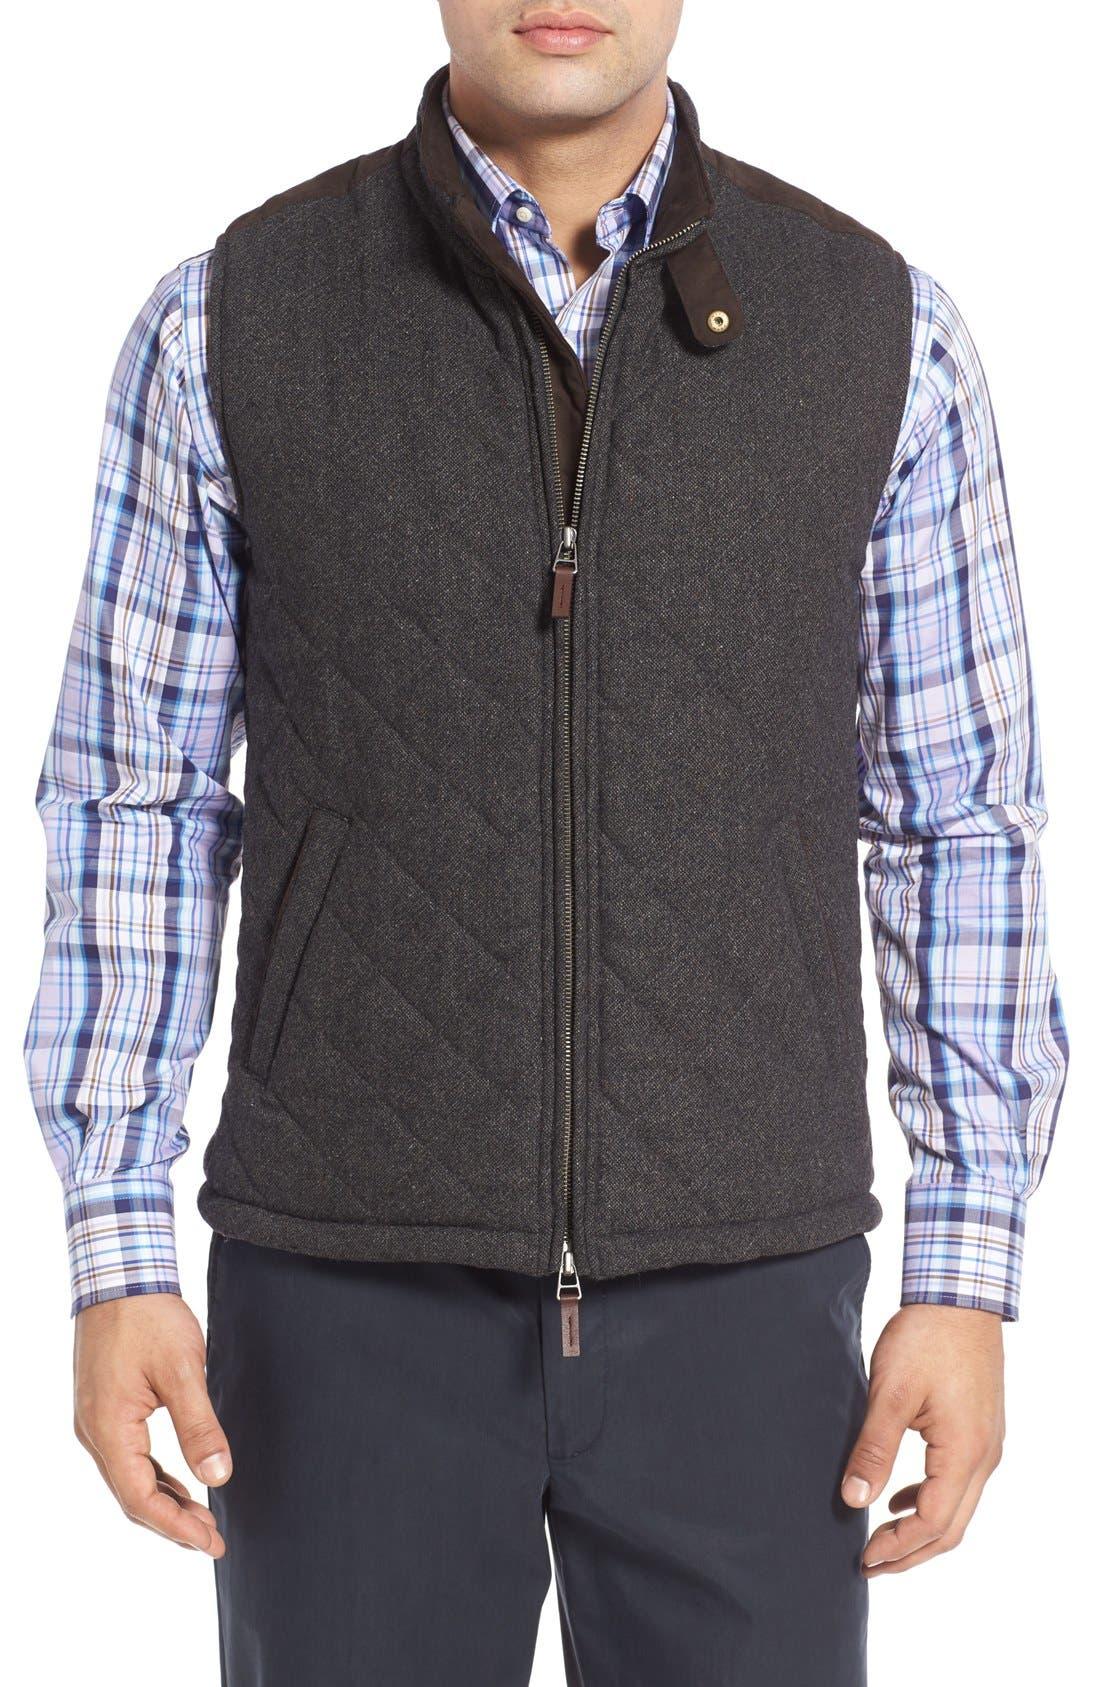 Main Image - John W. Nordstrom Regular Fit Quilted Tweed Vest